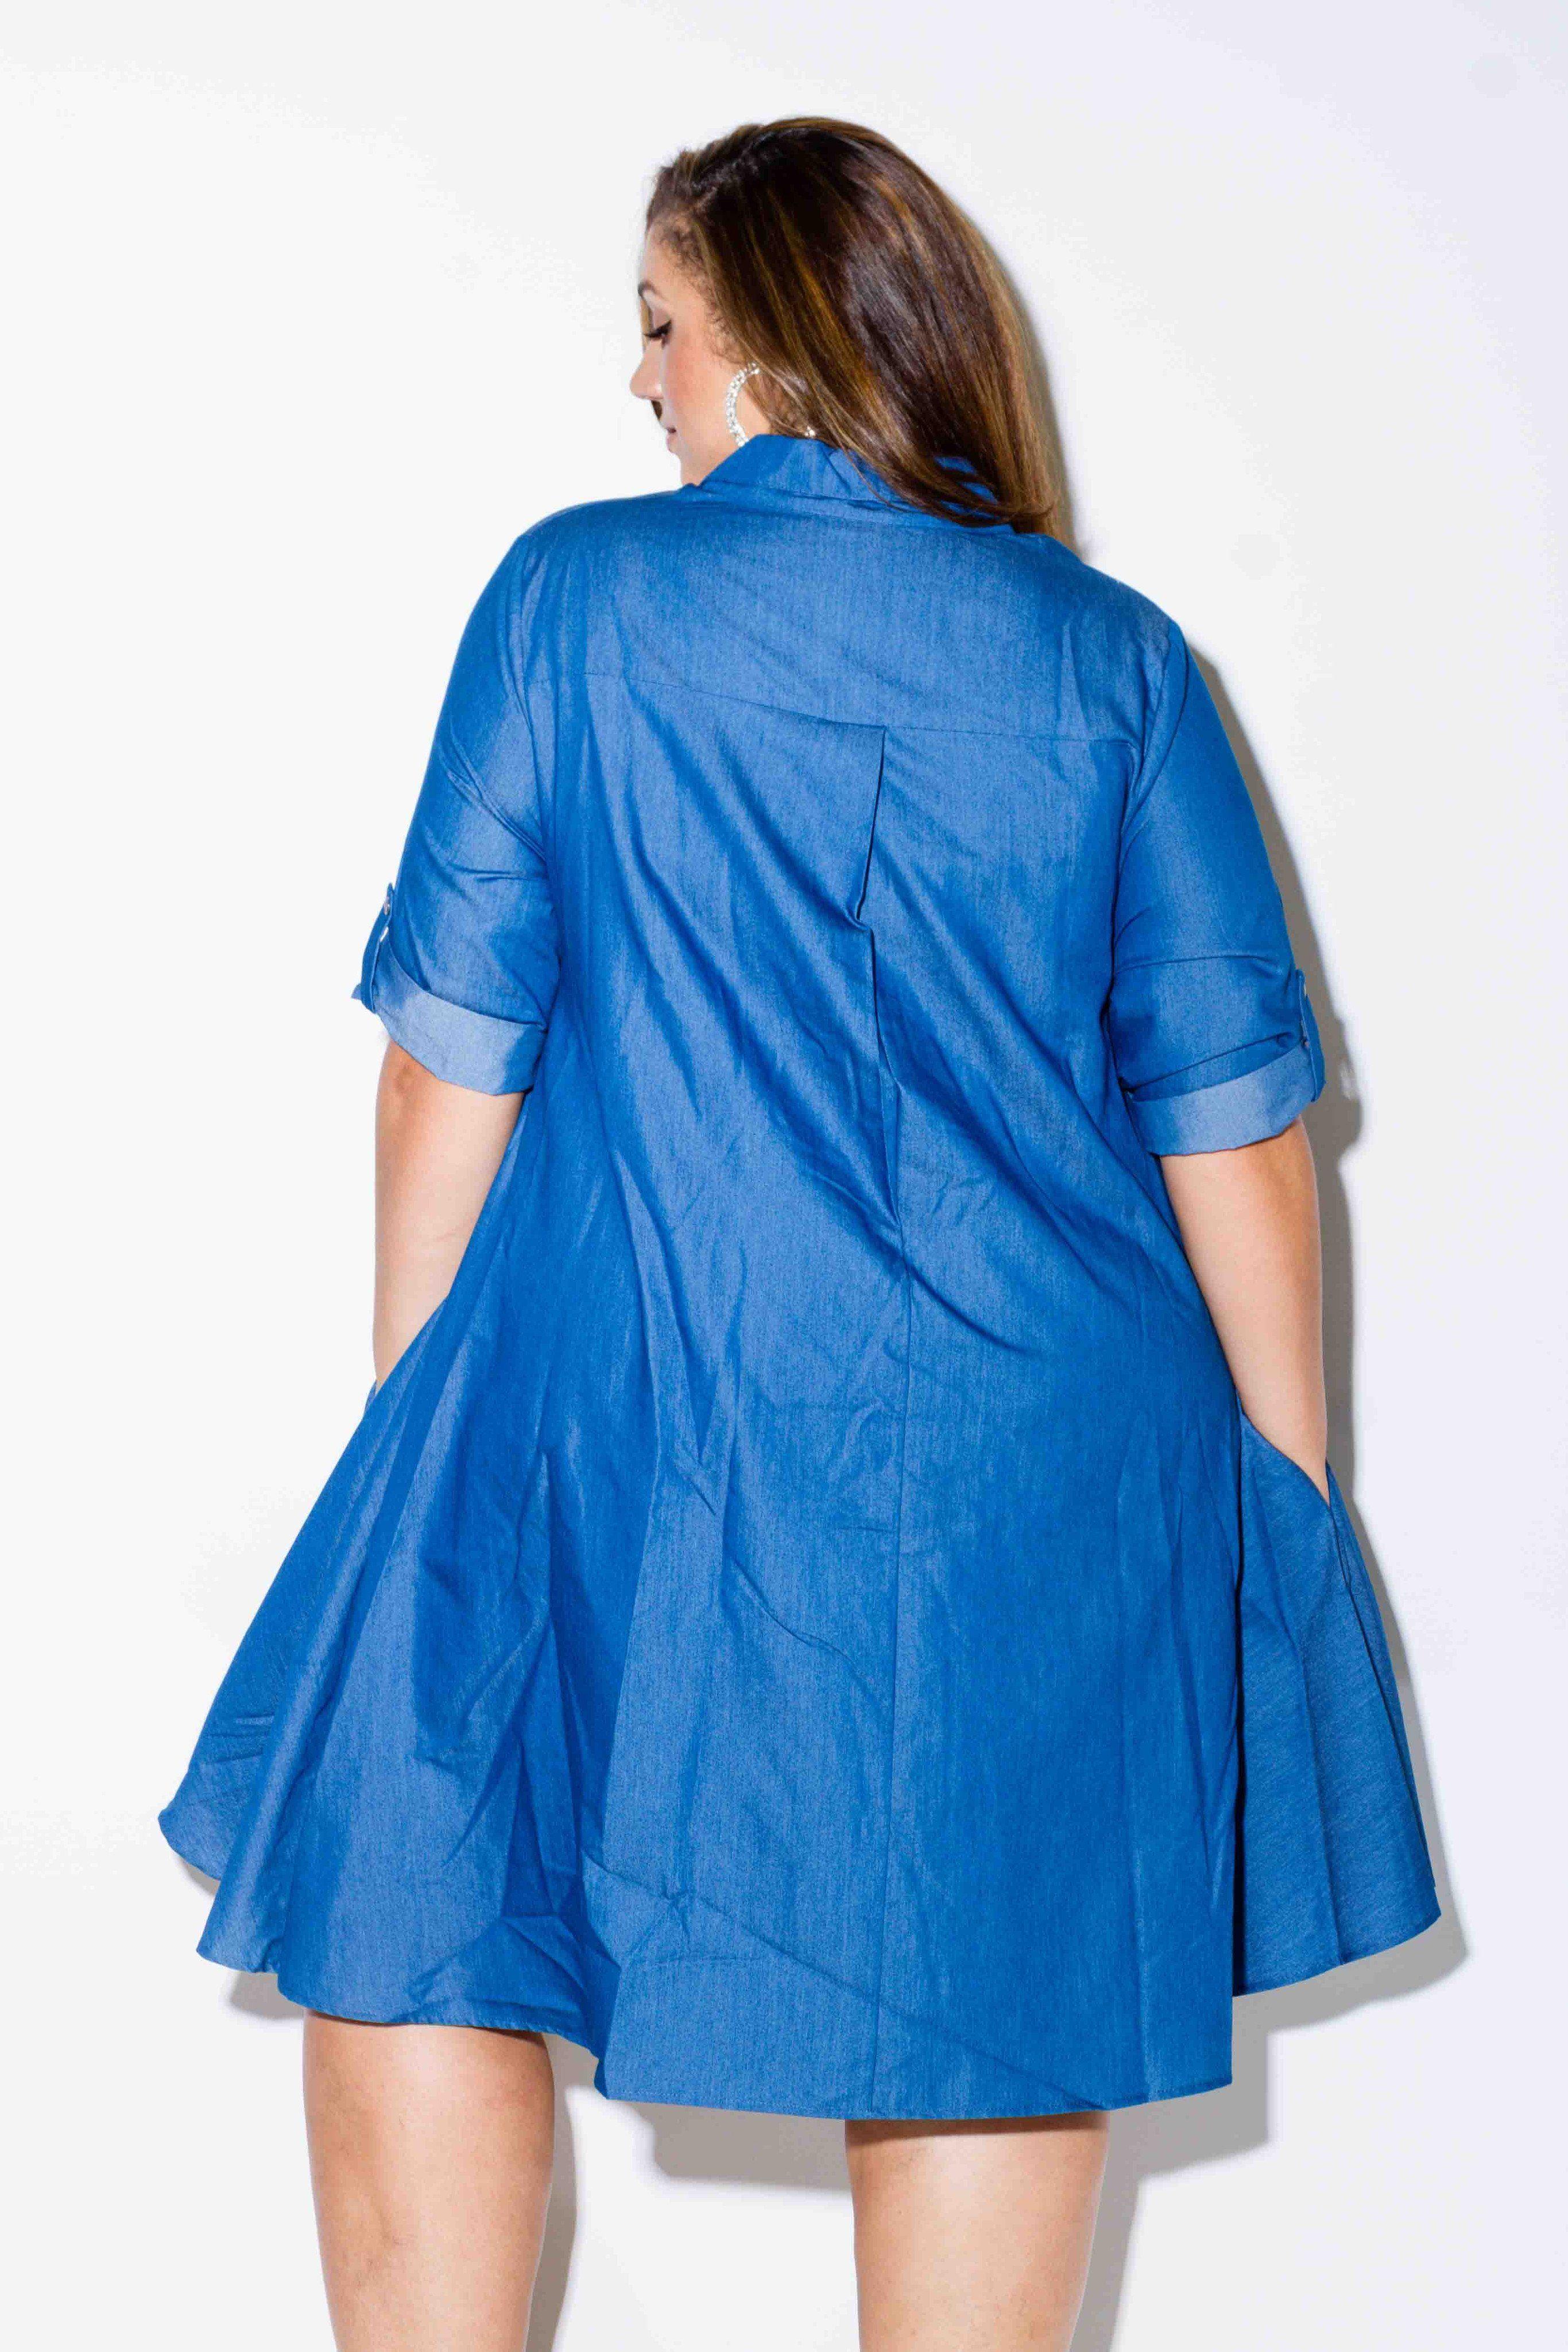 Plus Size Chambray Shirt Dress Erica Lauren Mcneill Pinkclubwear